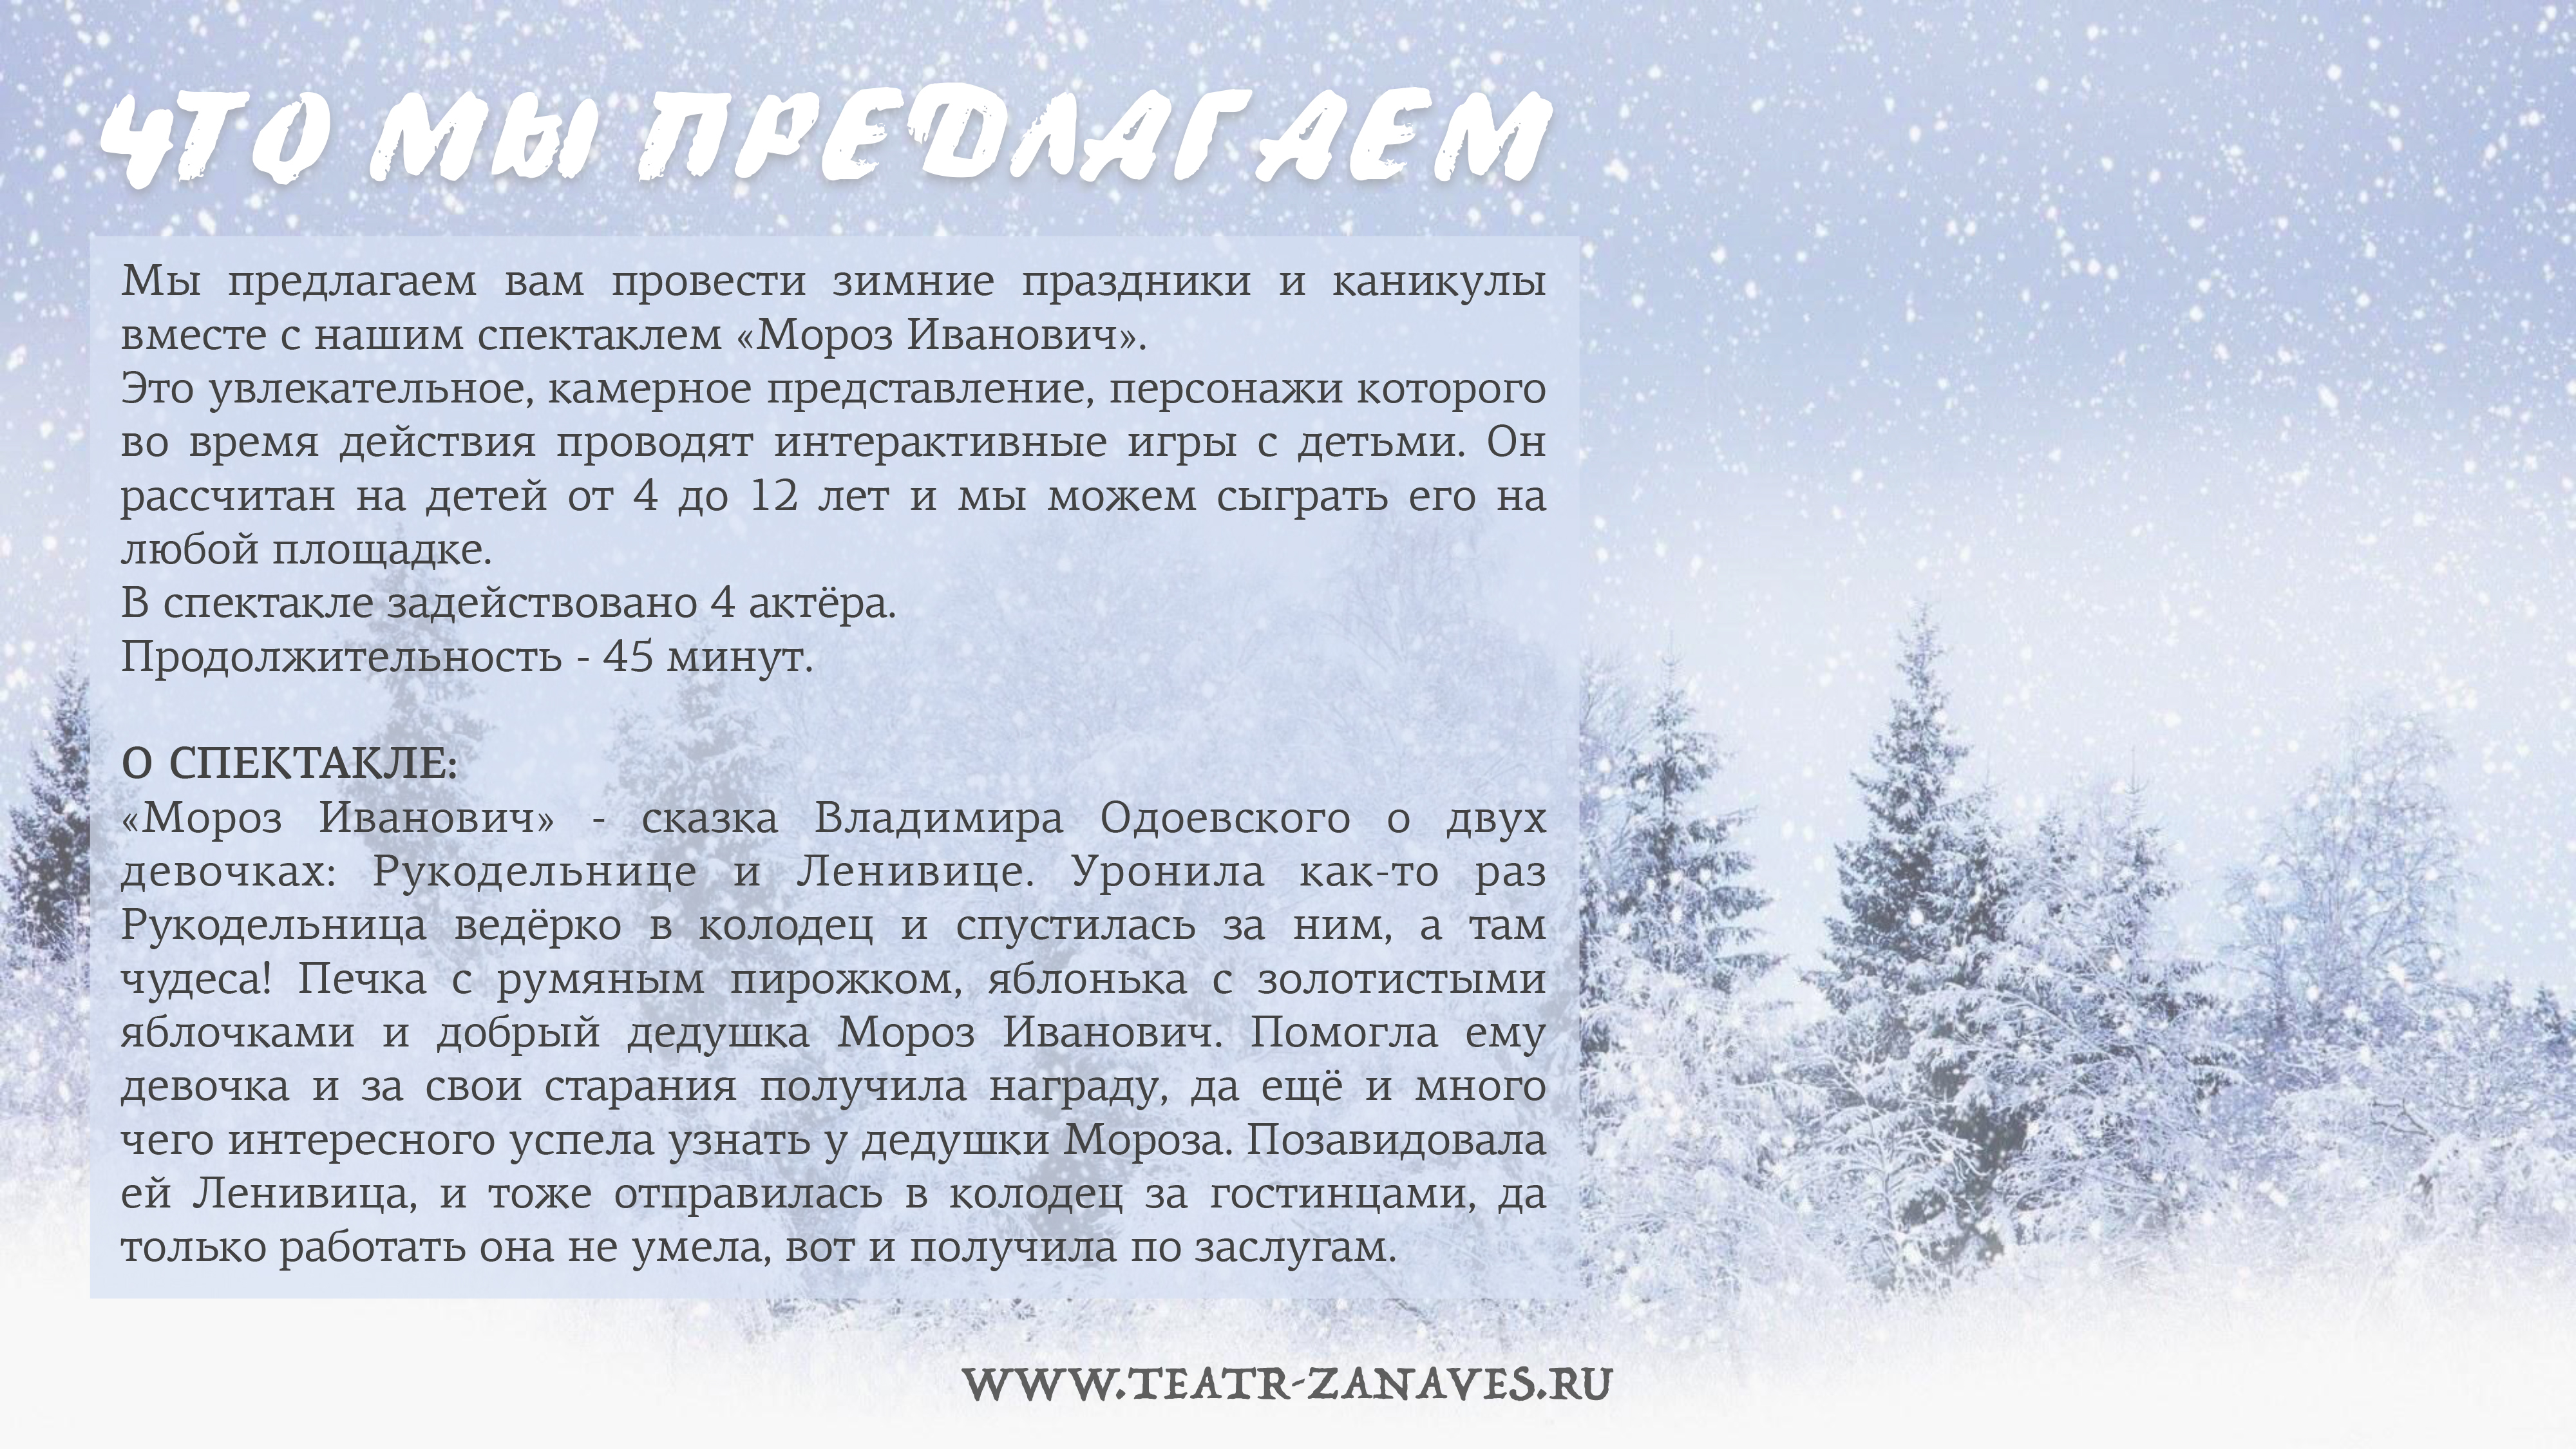 Spektakl-Moroz-Ivanovich-3